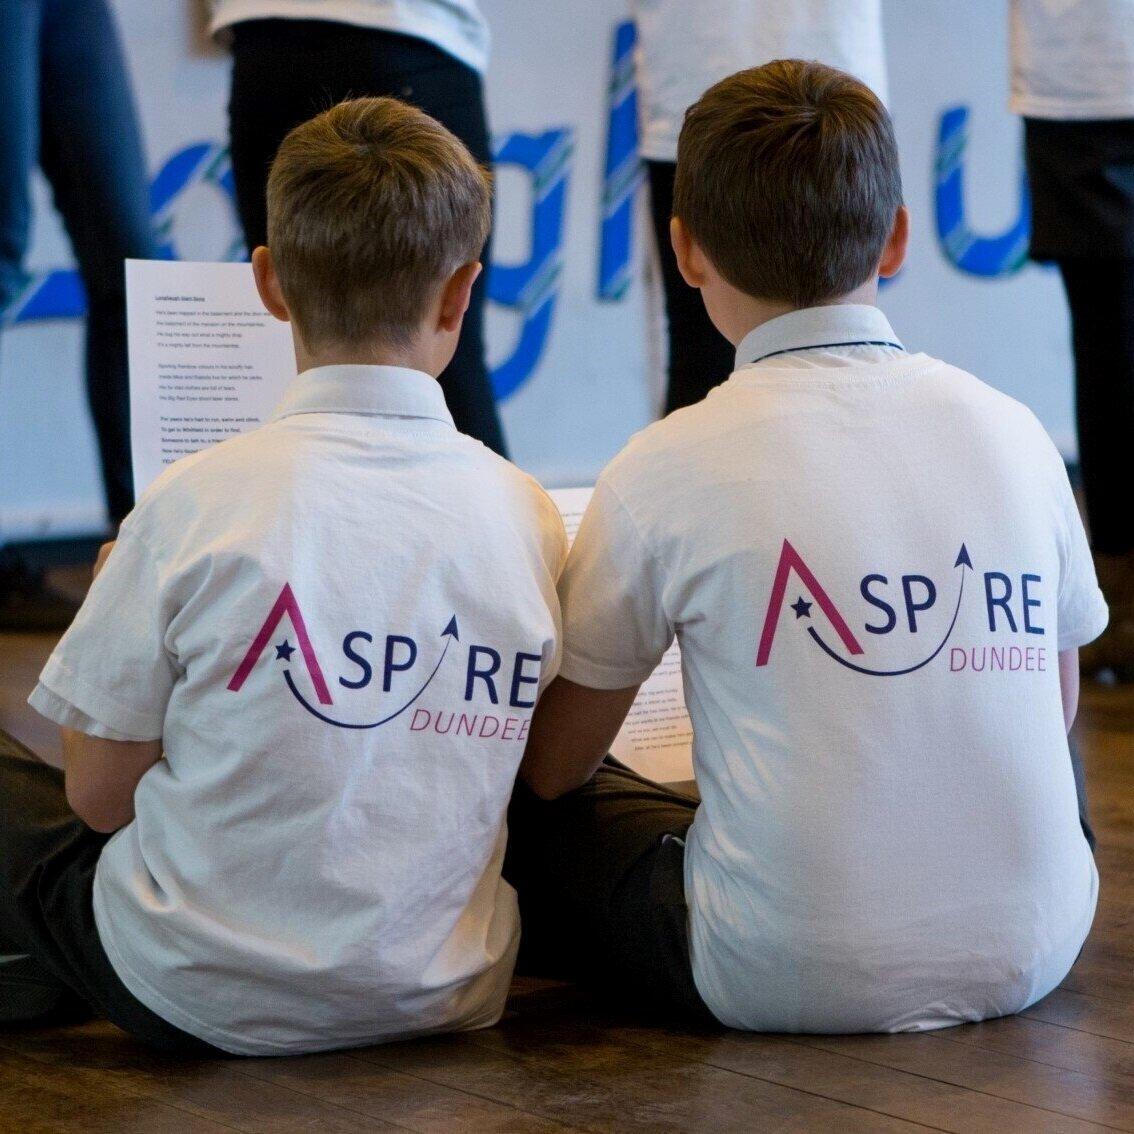 Image: ASPIRE Drama rehearsals